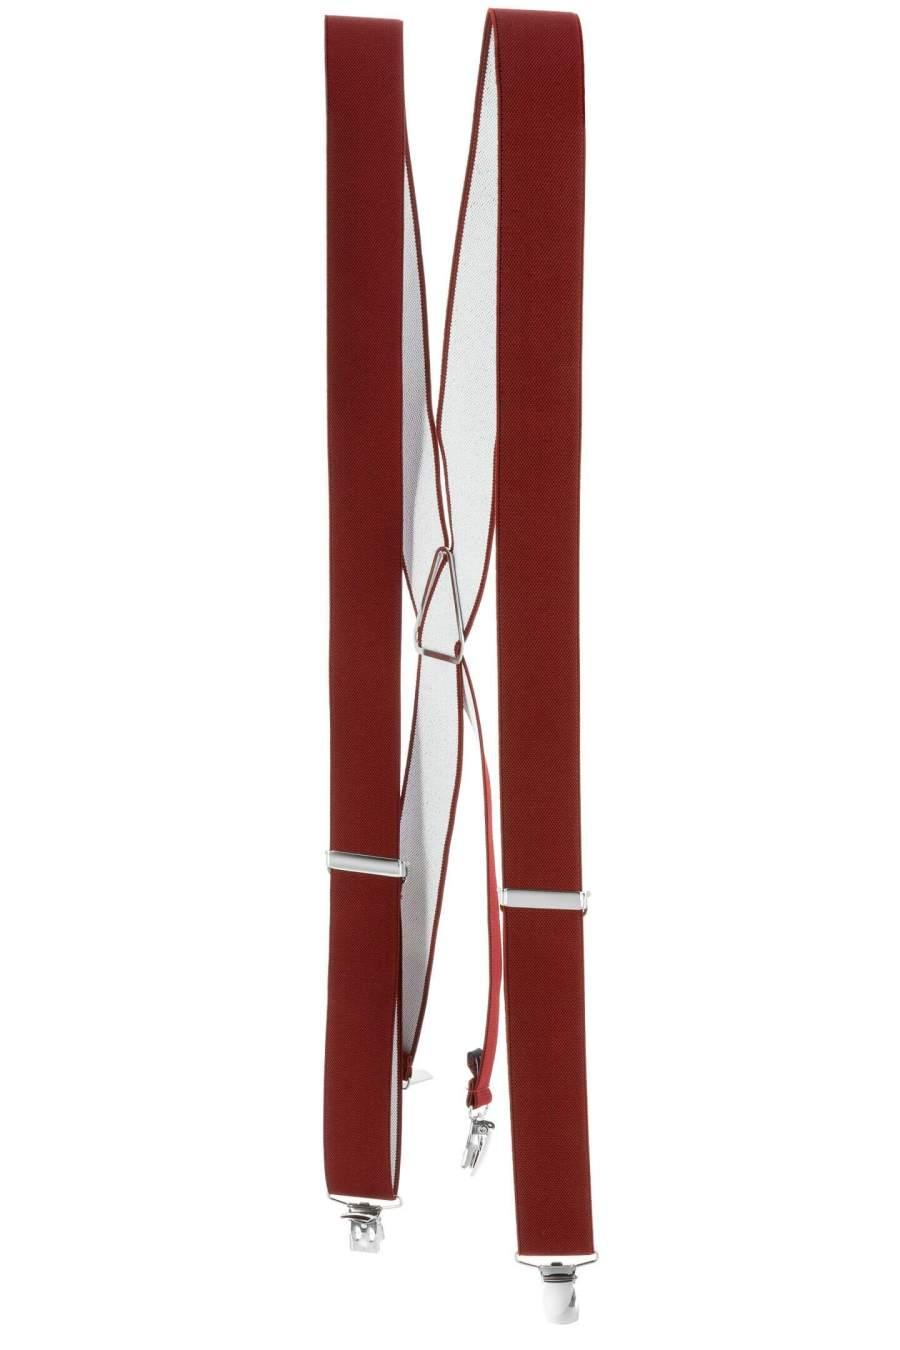 regali di San Valentino originali per lui bretelle rosse